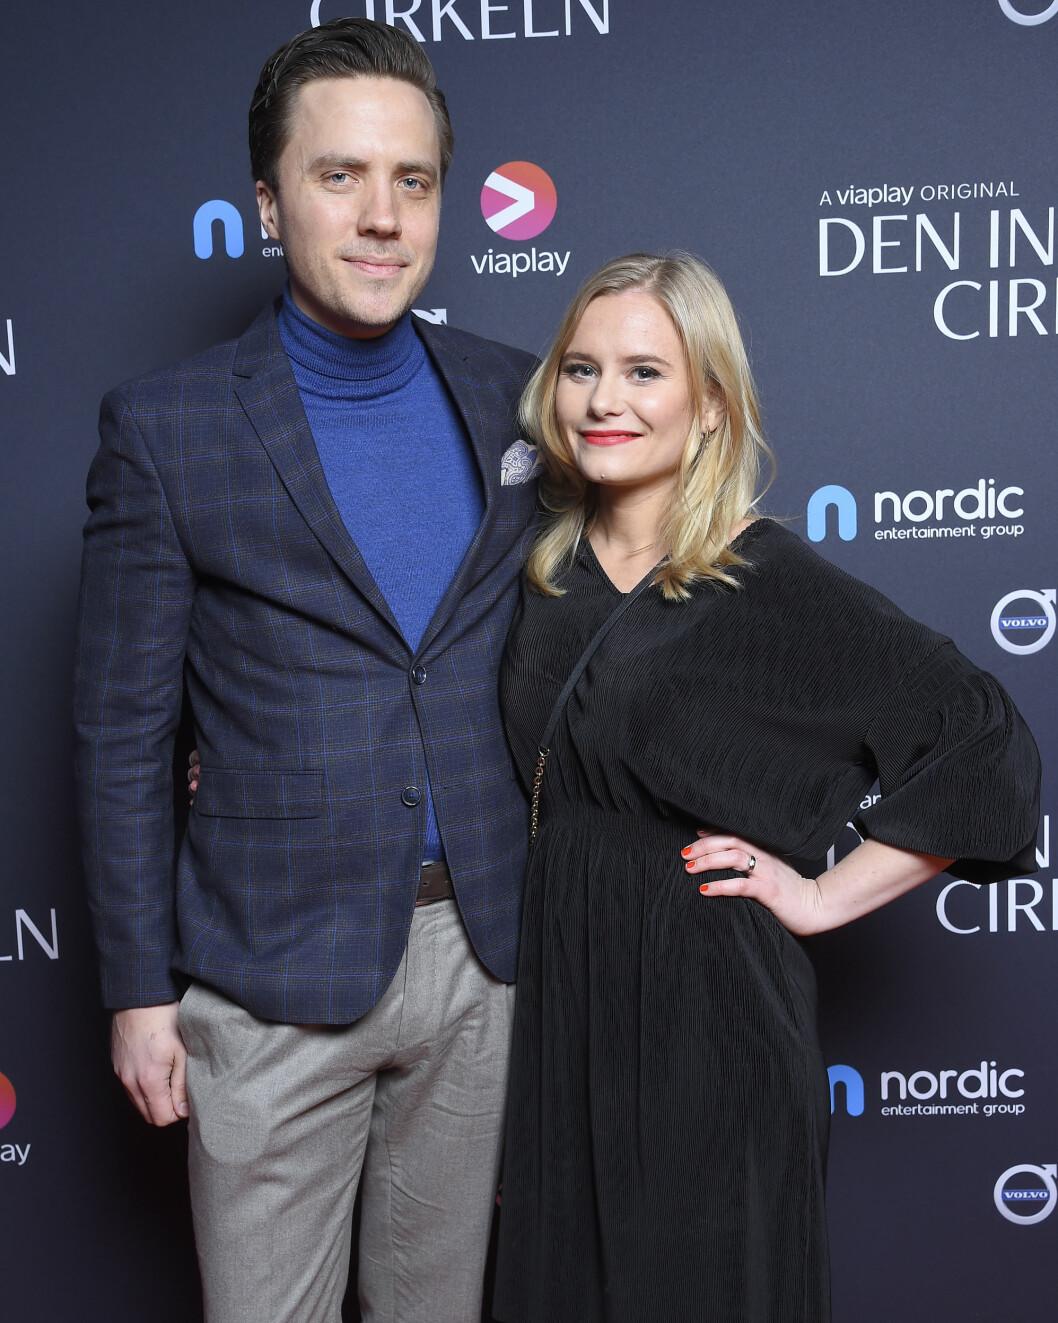 Juristen Philip Stragne och Ebba Hultkvist Stragne.